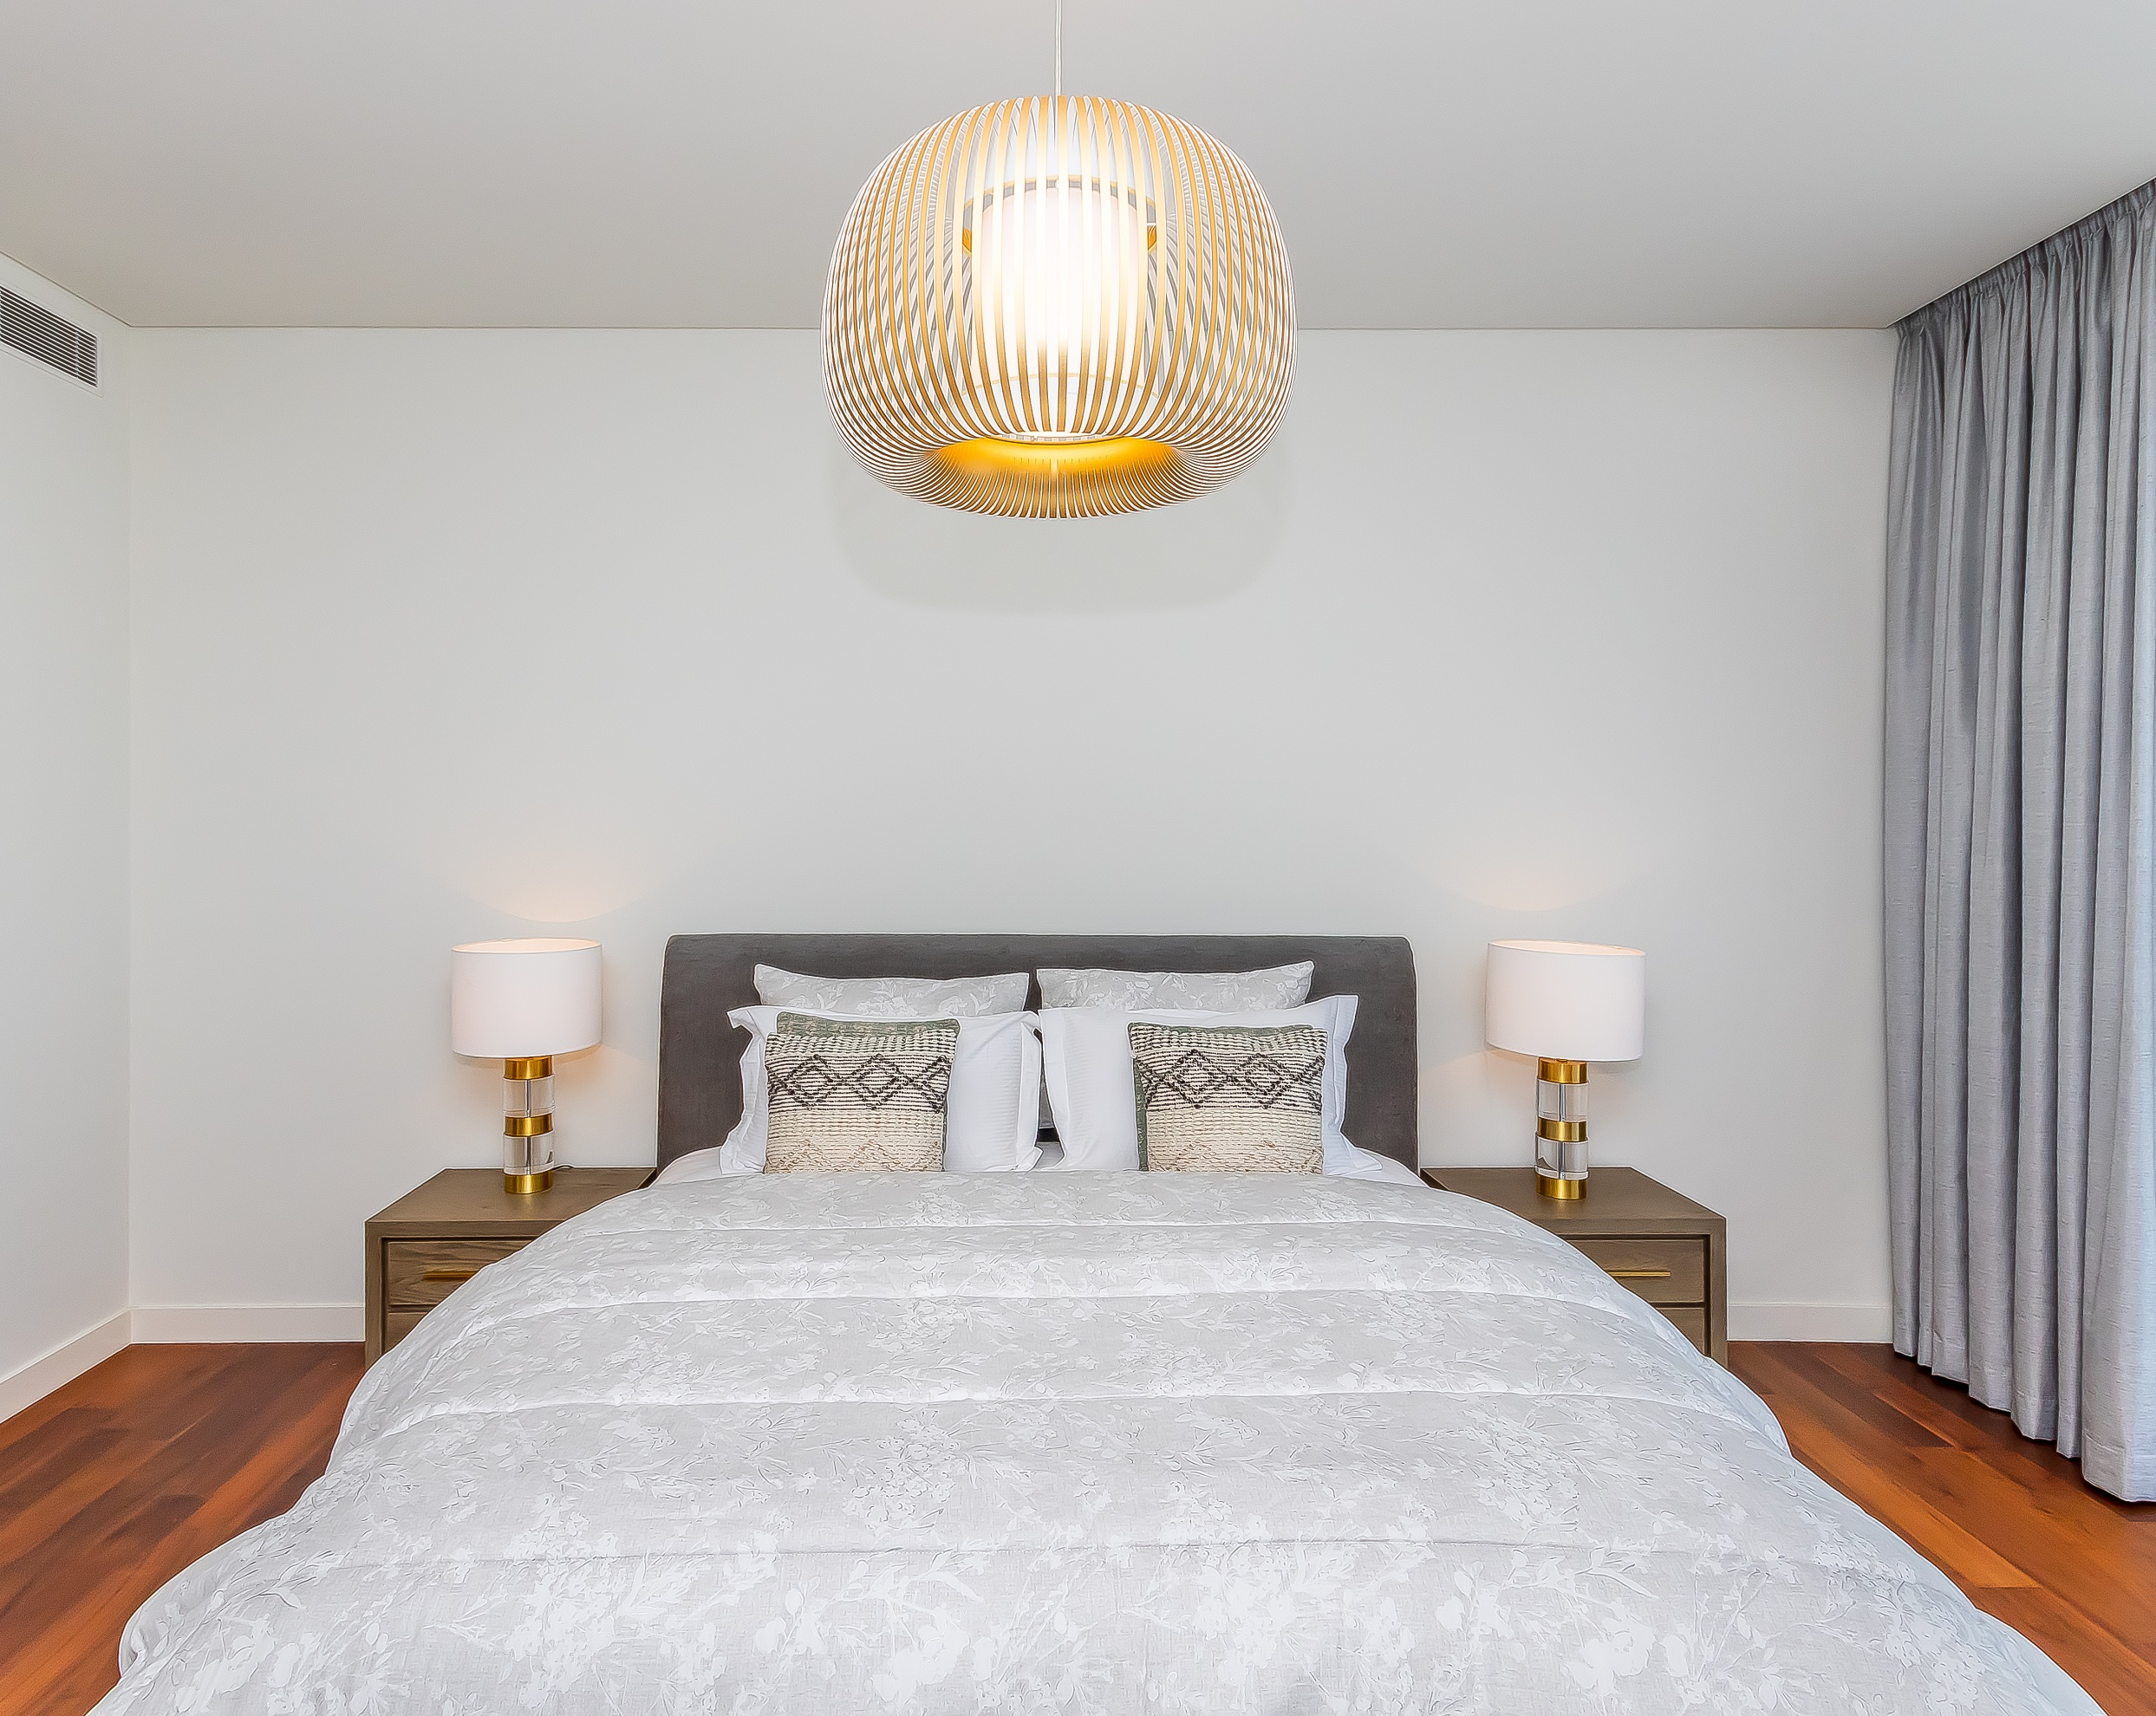 Apartment  Remarkable Value   Unbeatable Location  3 Beds City Walk B 10 309 photo 24142313